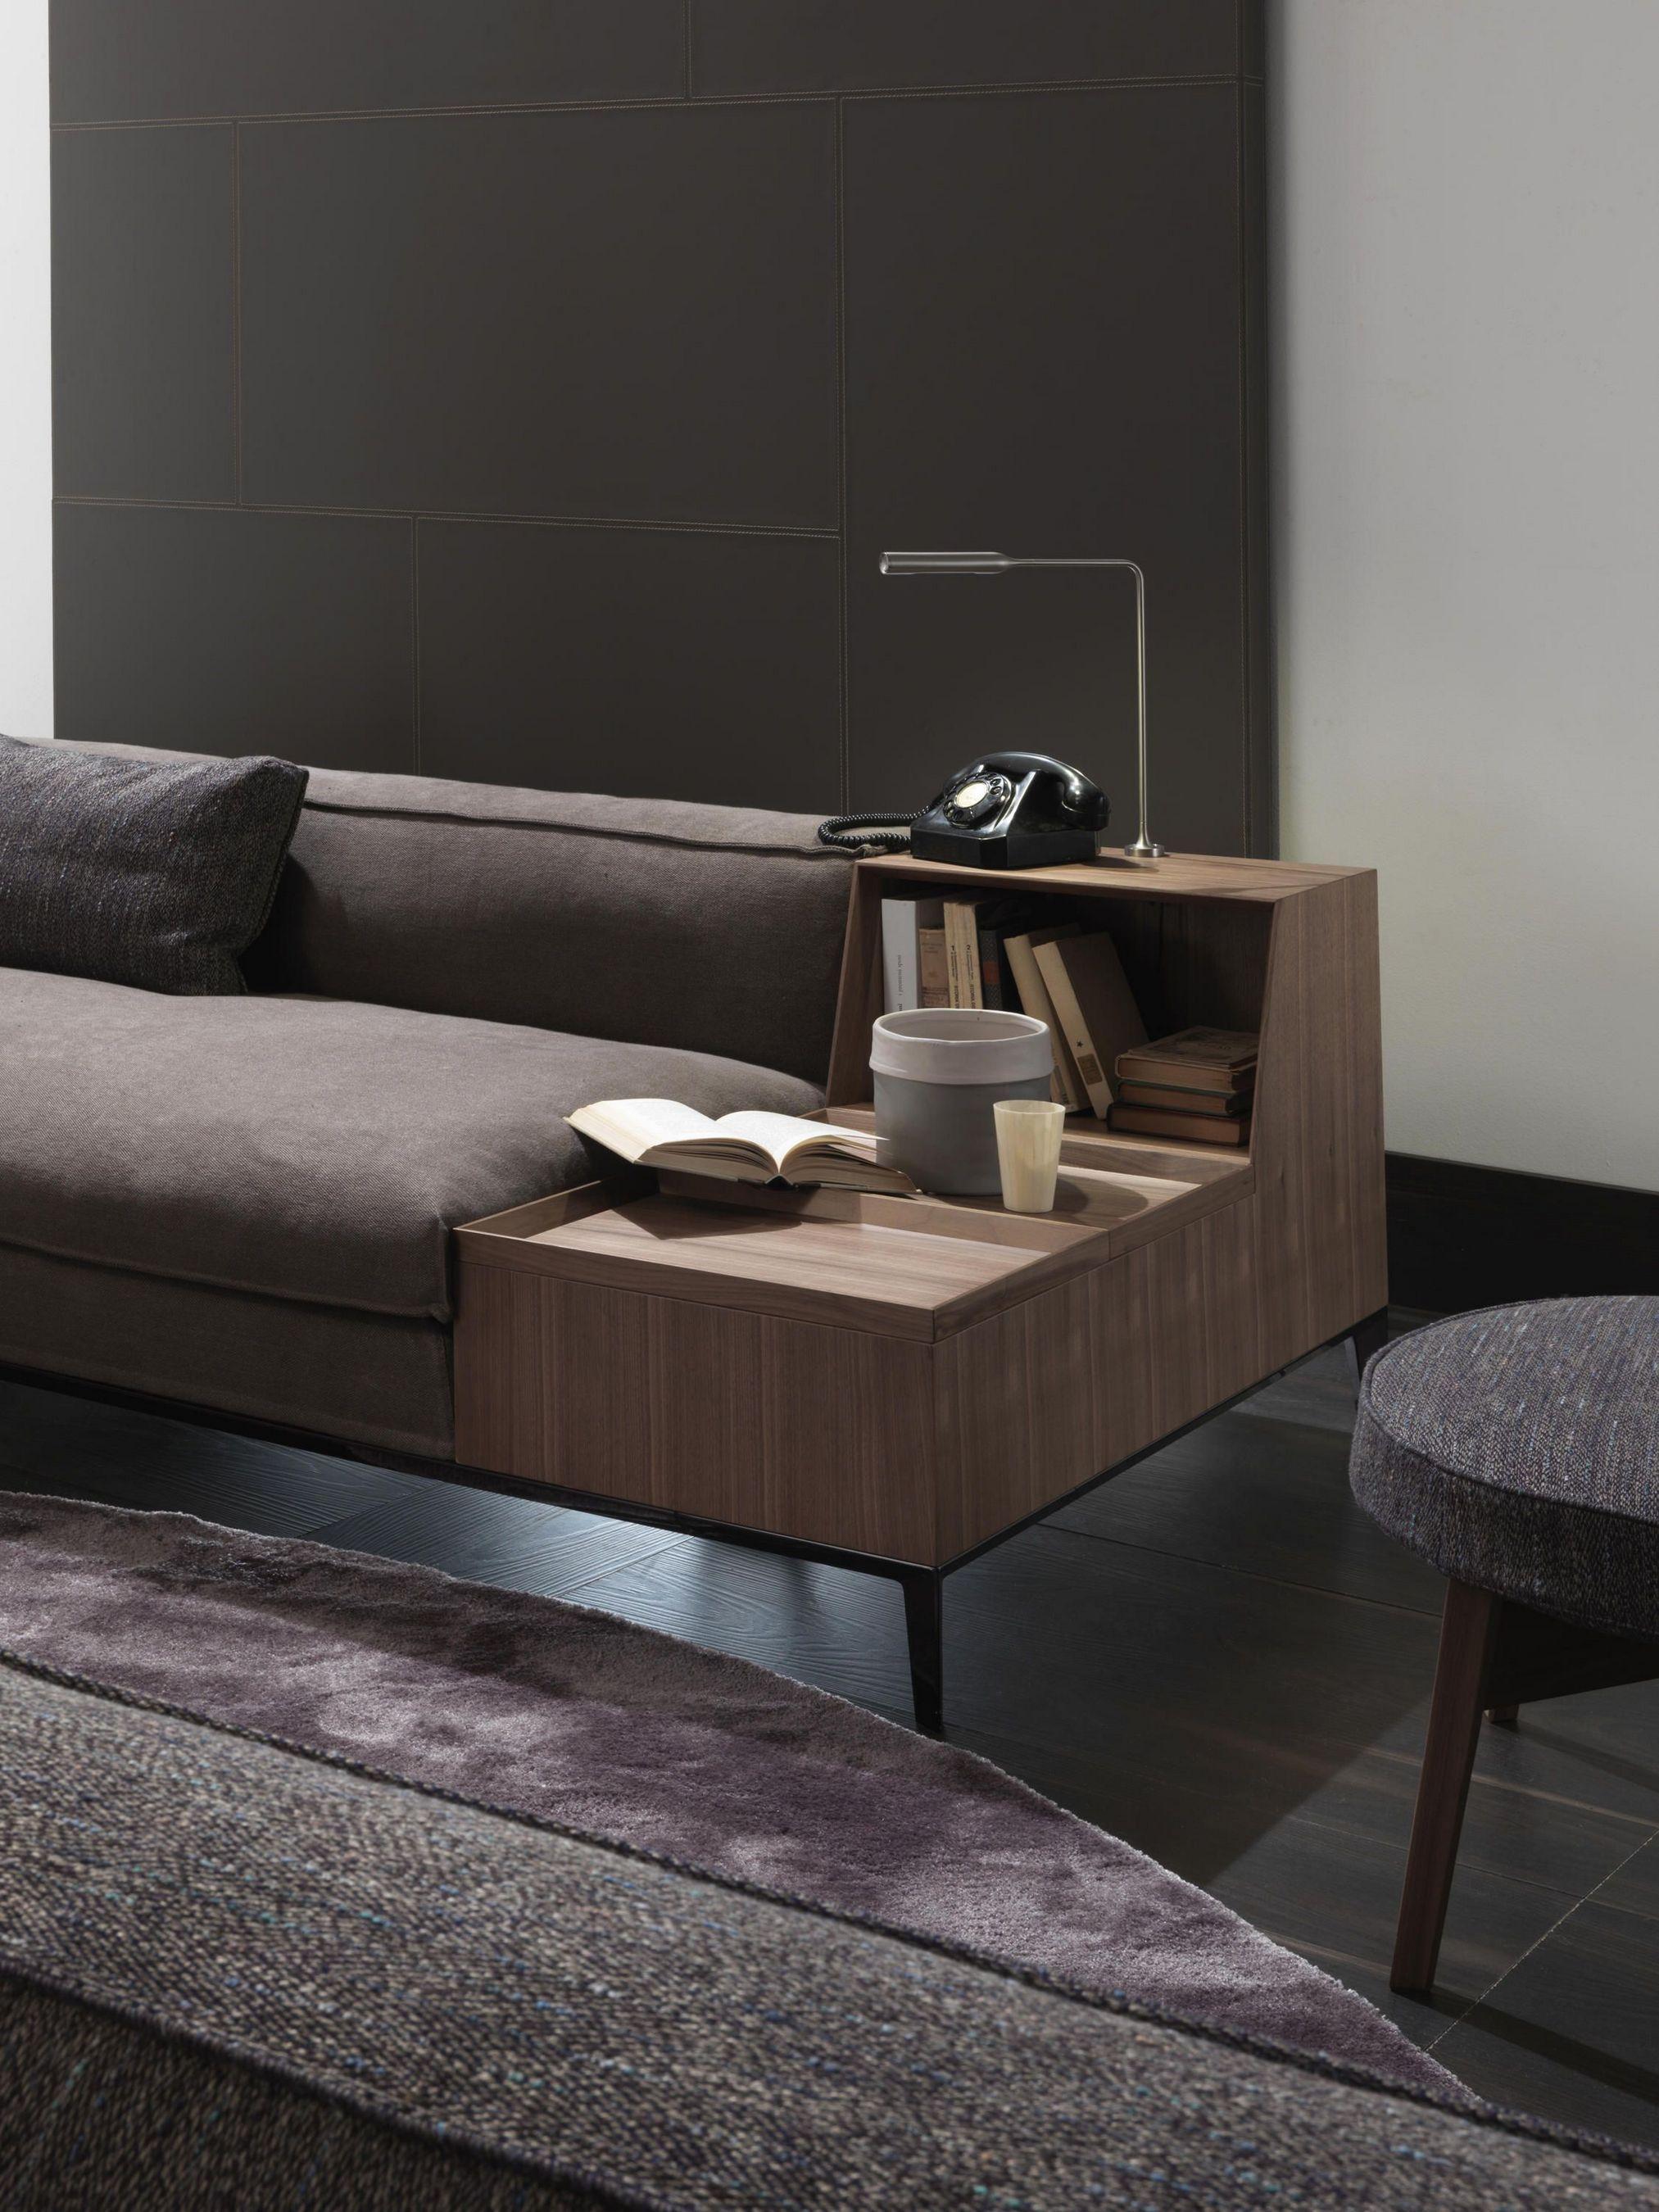 How To Arrange Living Room Furniture Square Feet - Modern ...